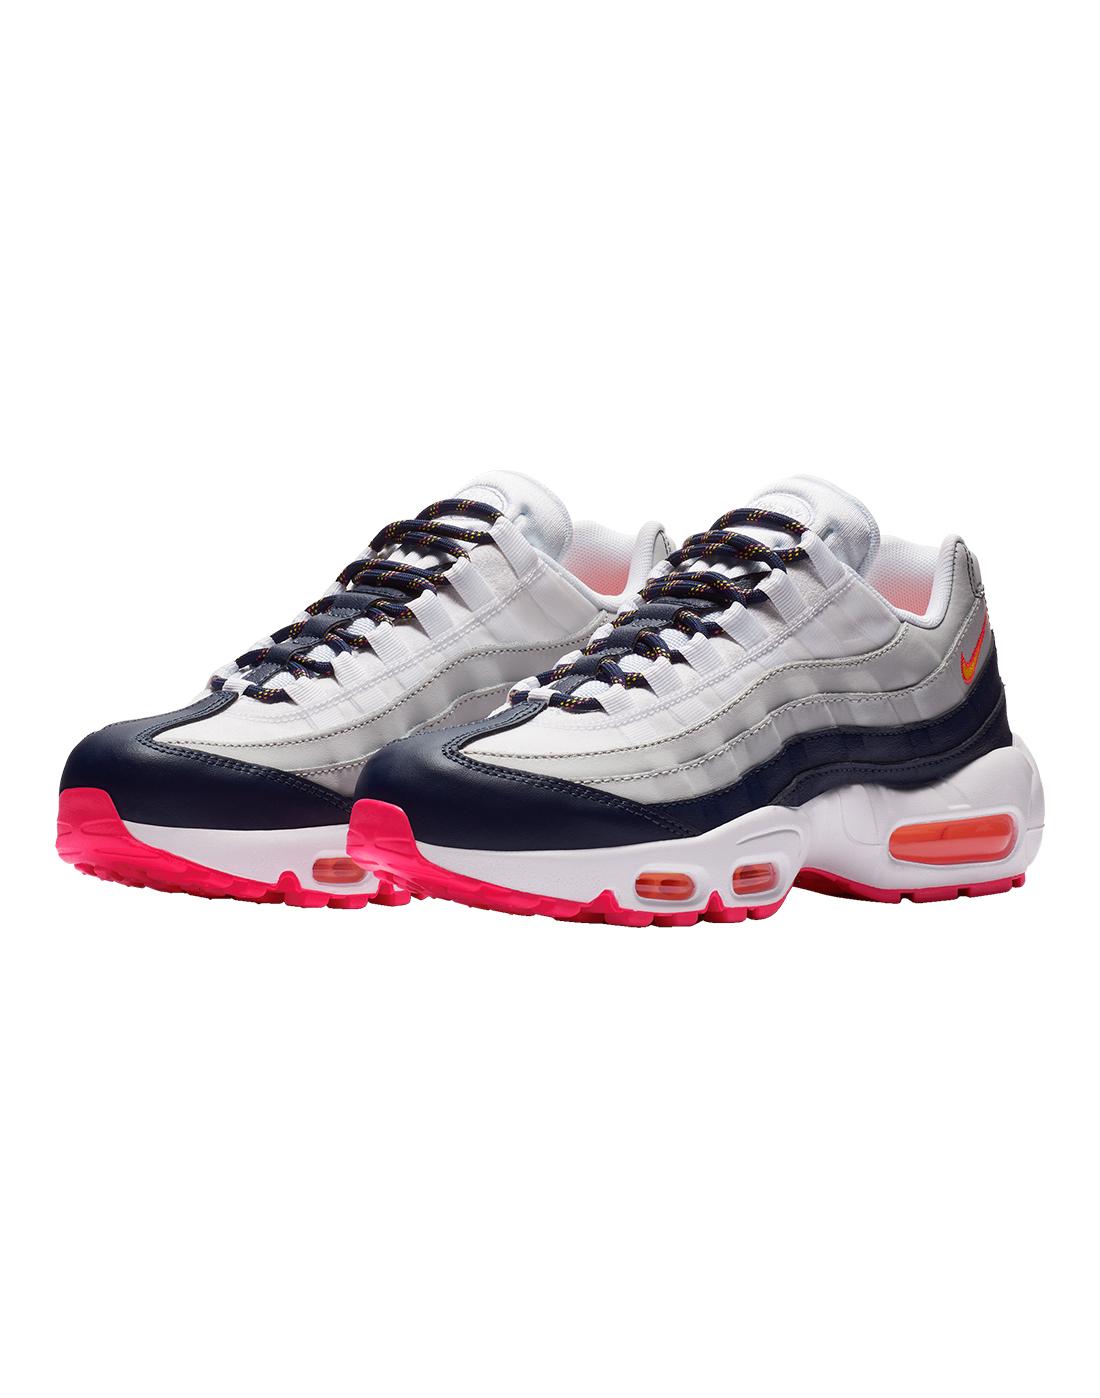 843b4ae690 Women's Pink, Blue & White Nike Air Max 95 | Life Style Sports